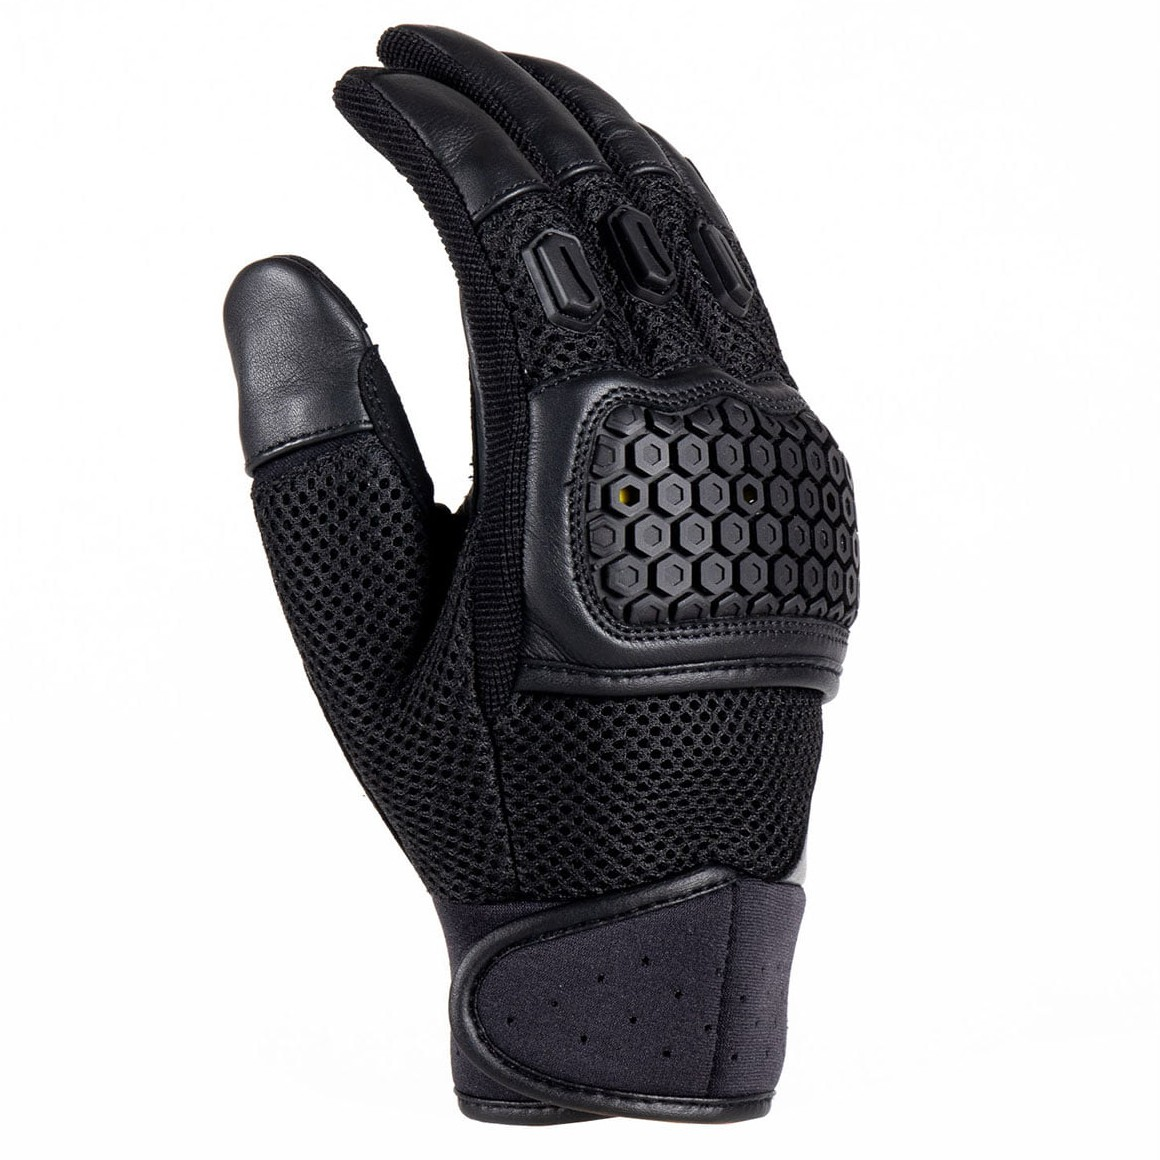 Knox Urbane Pro MC-Handskar, Svarta